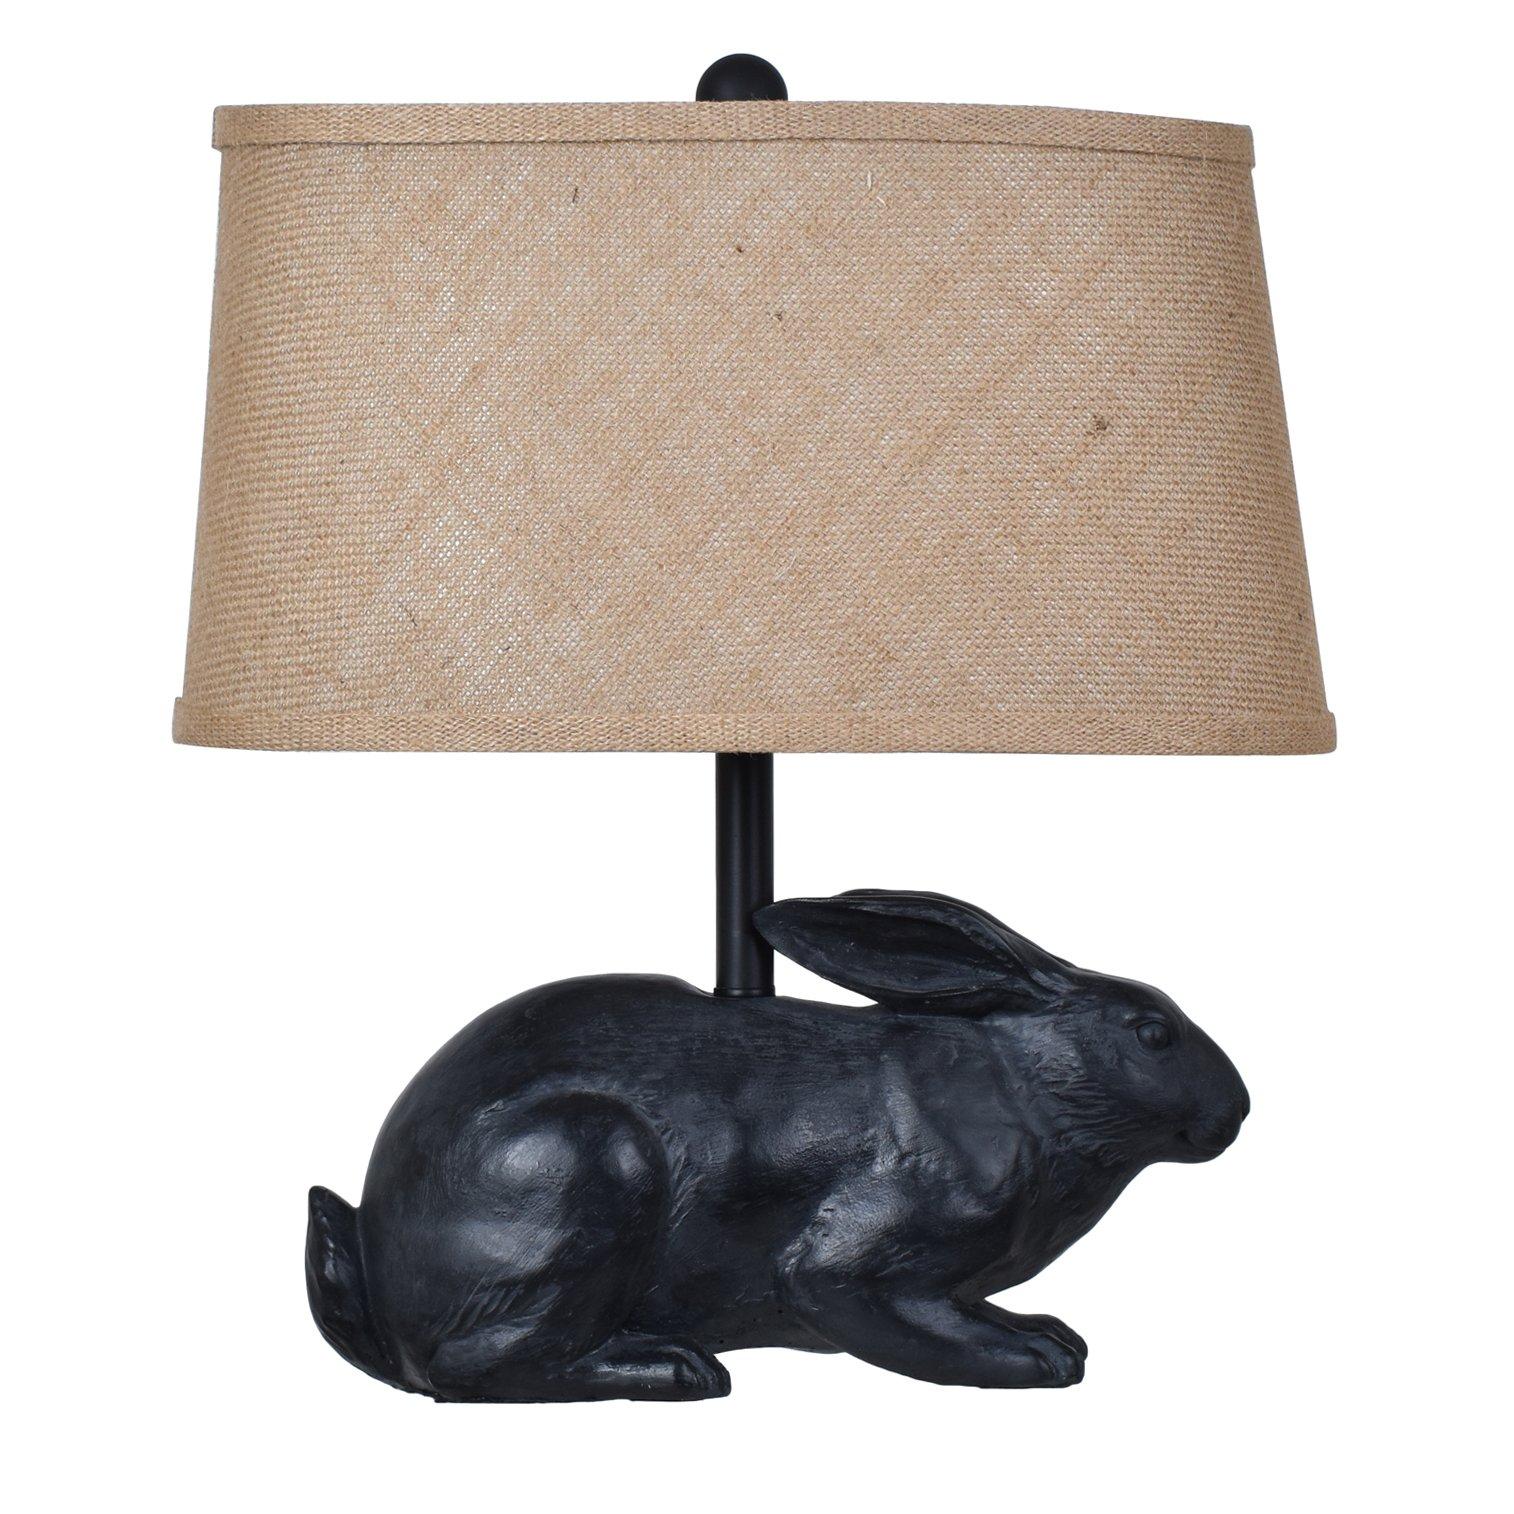 Crestview Collection Rabbit Black Animal Sculpture Table Lamp